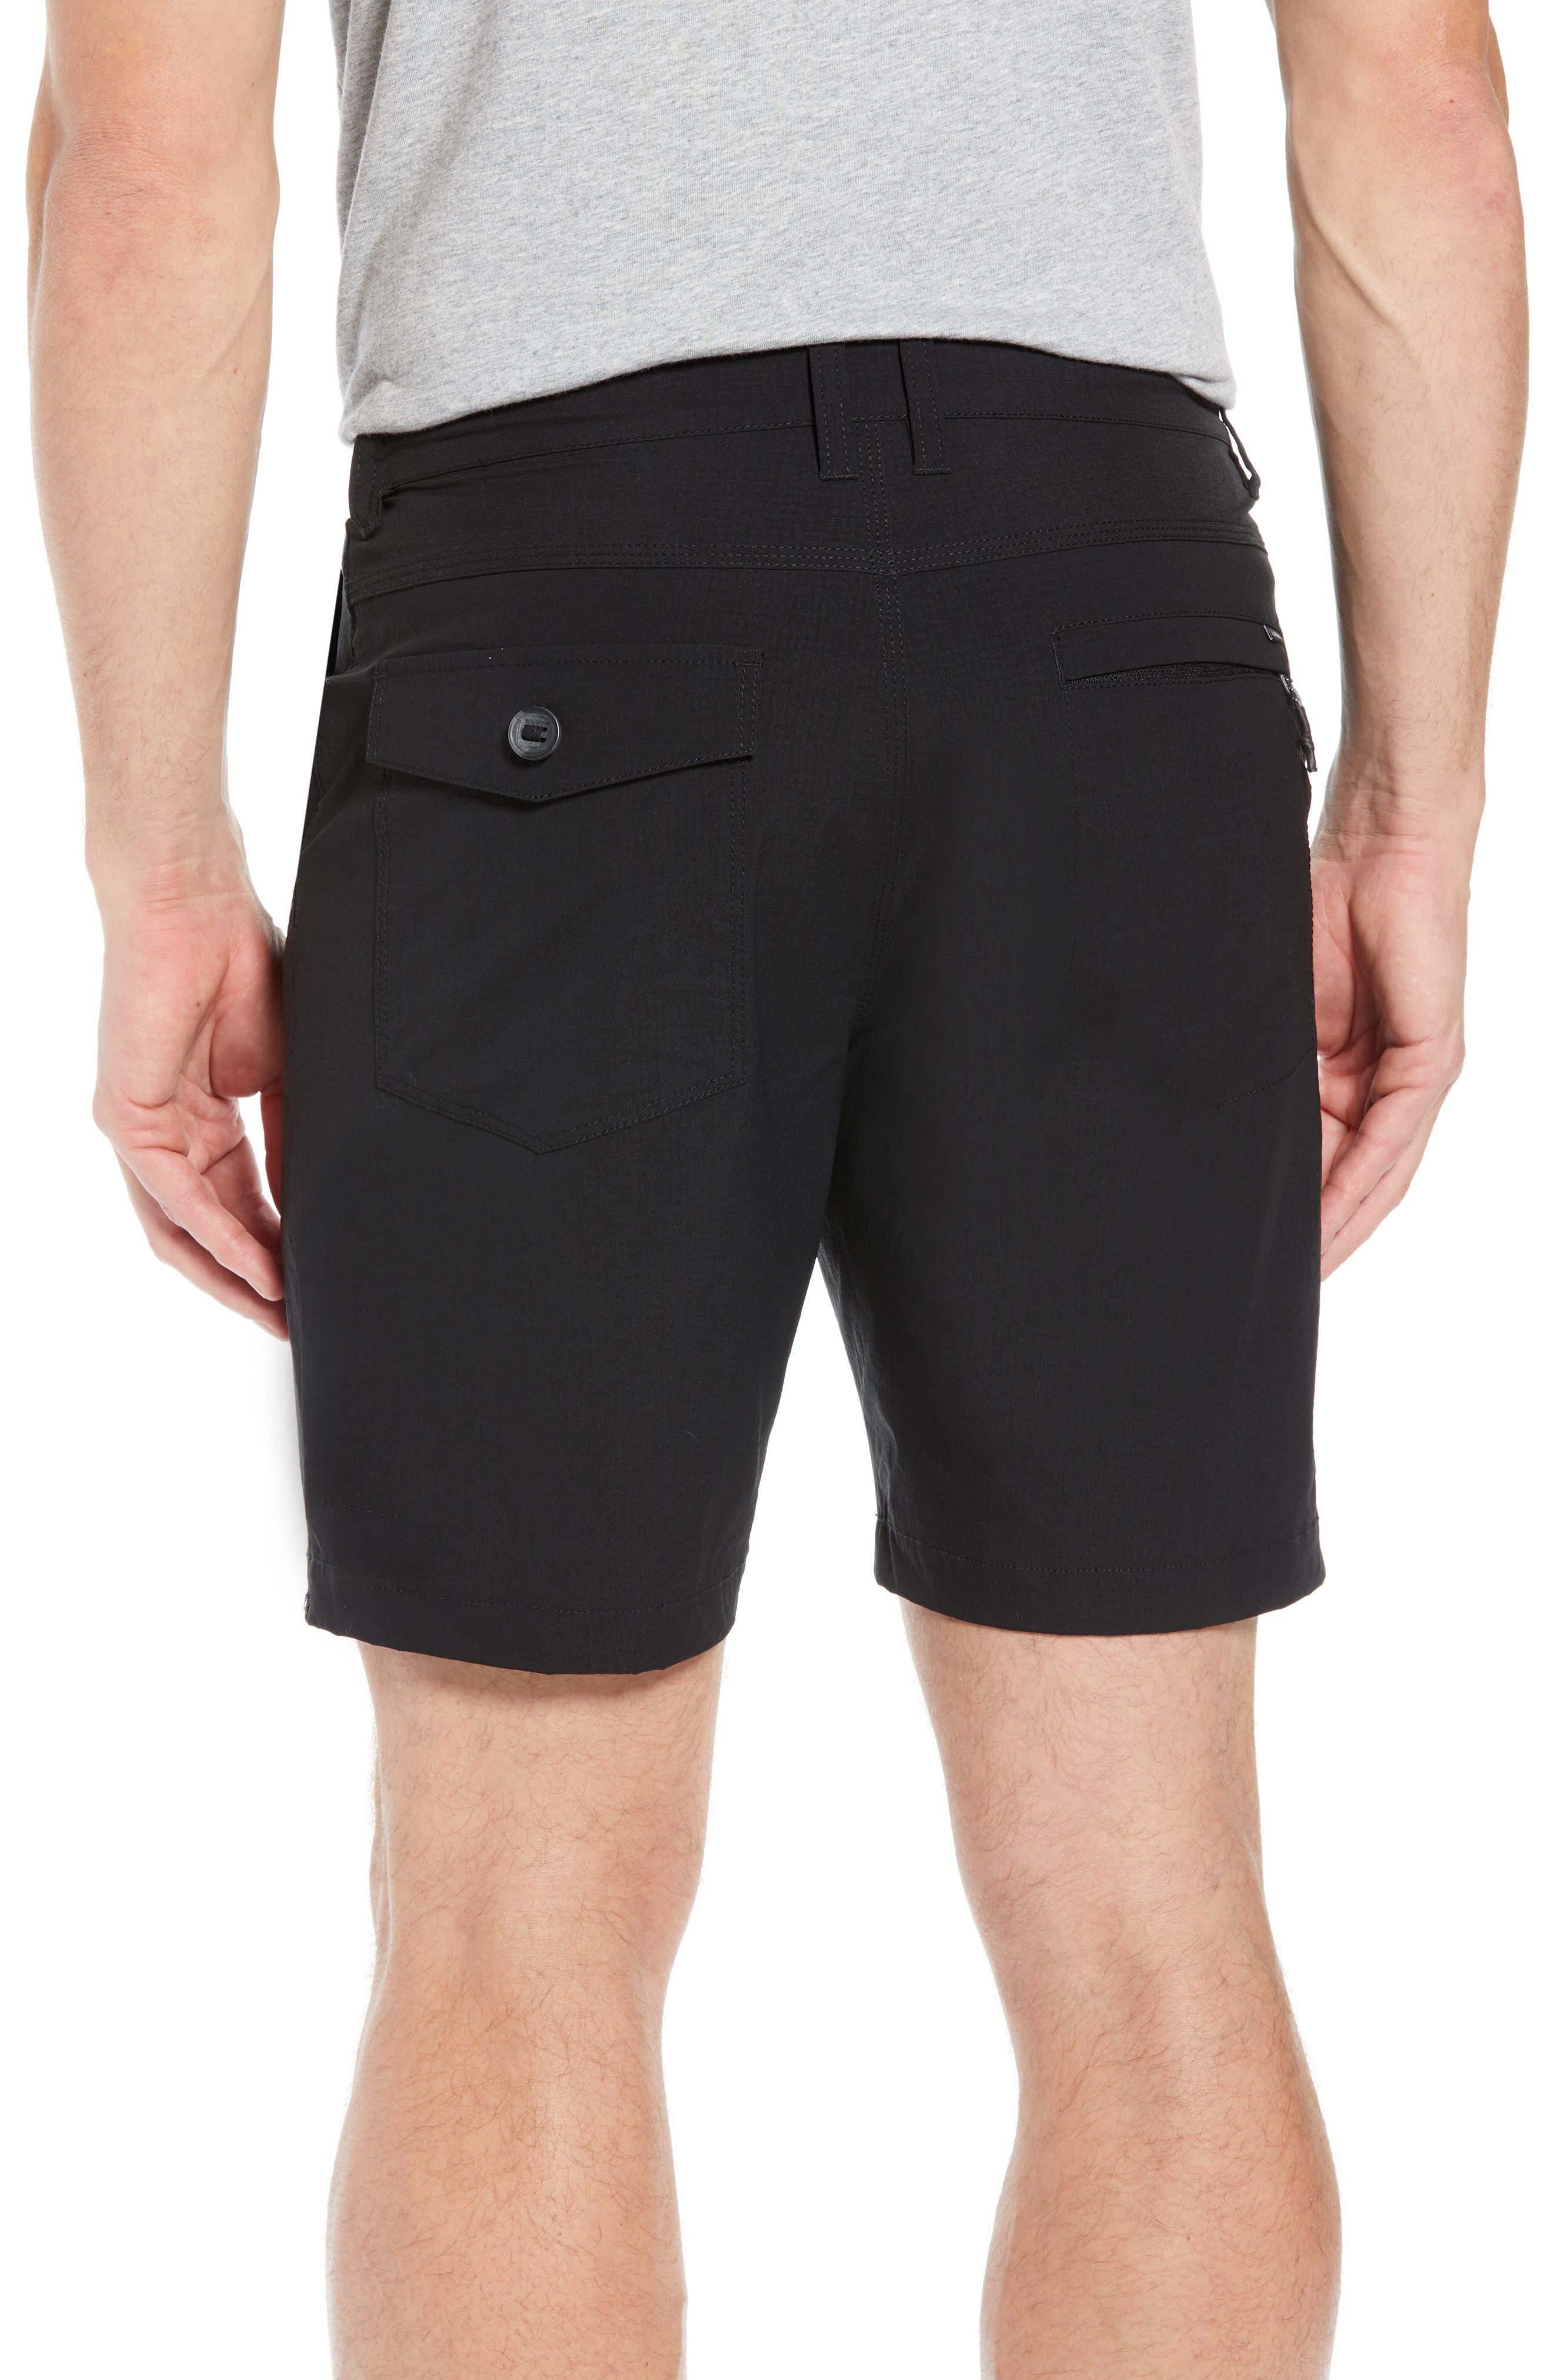 Surfreak Hybrid Shorts,                             Alternate thumbnail 2, color,                             BLACK